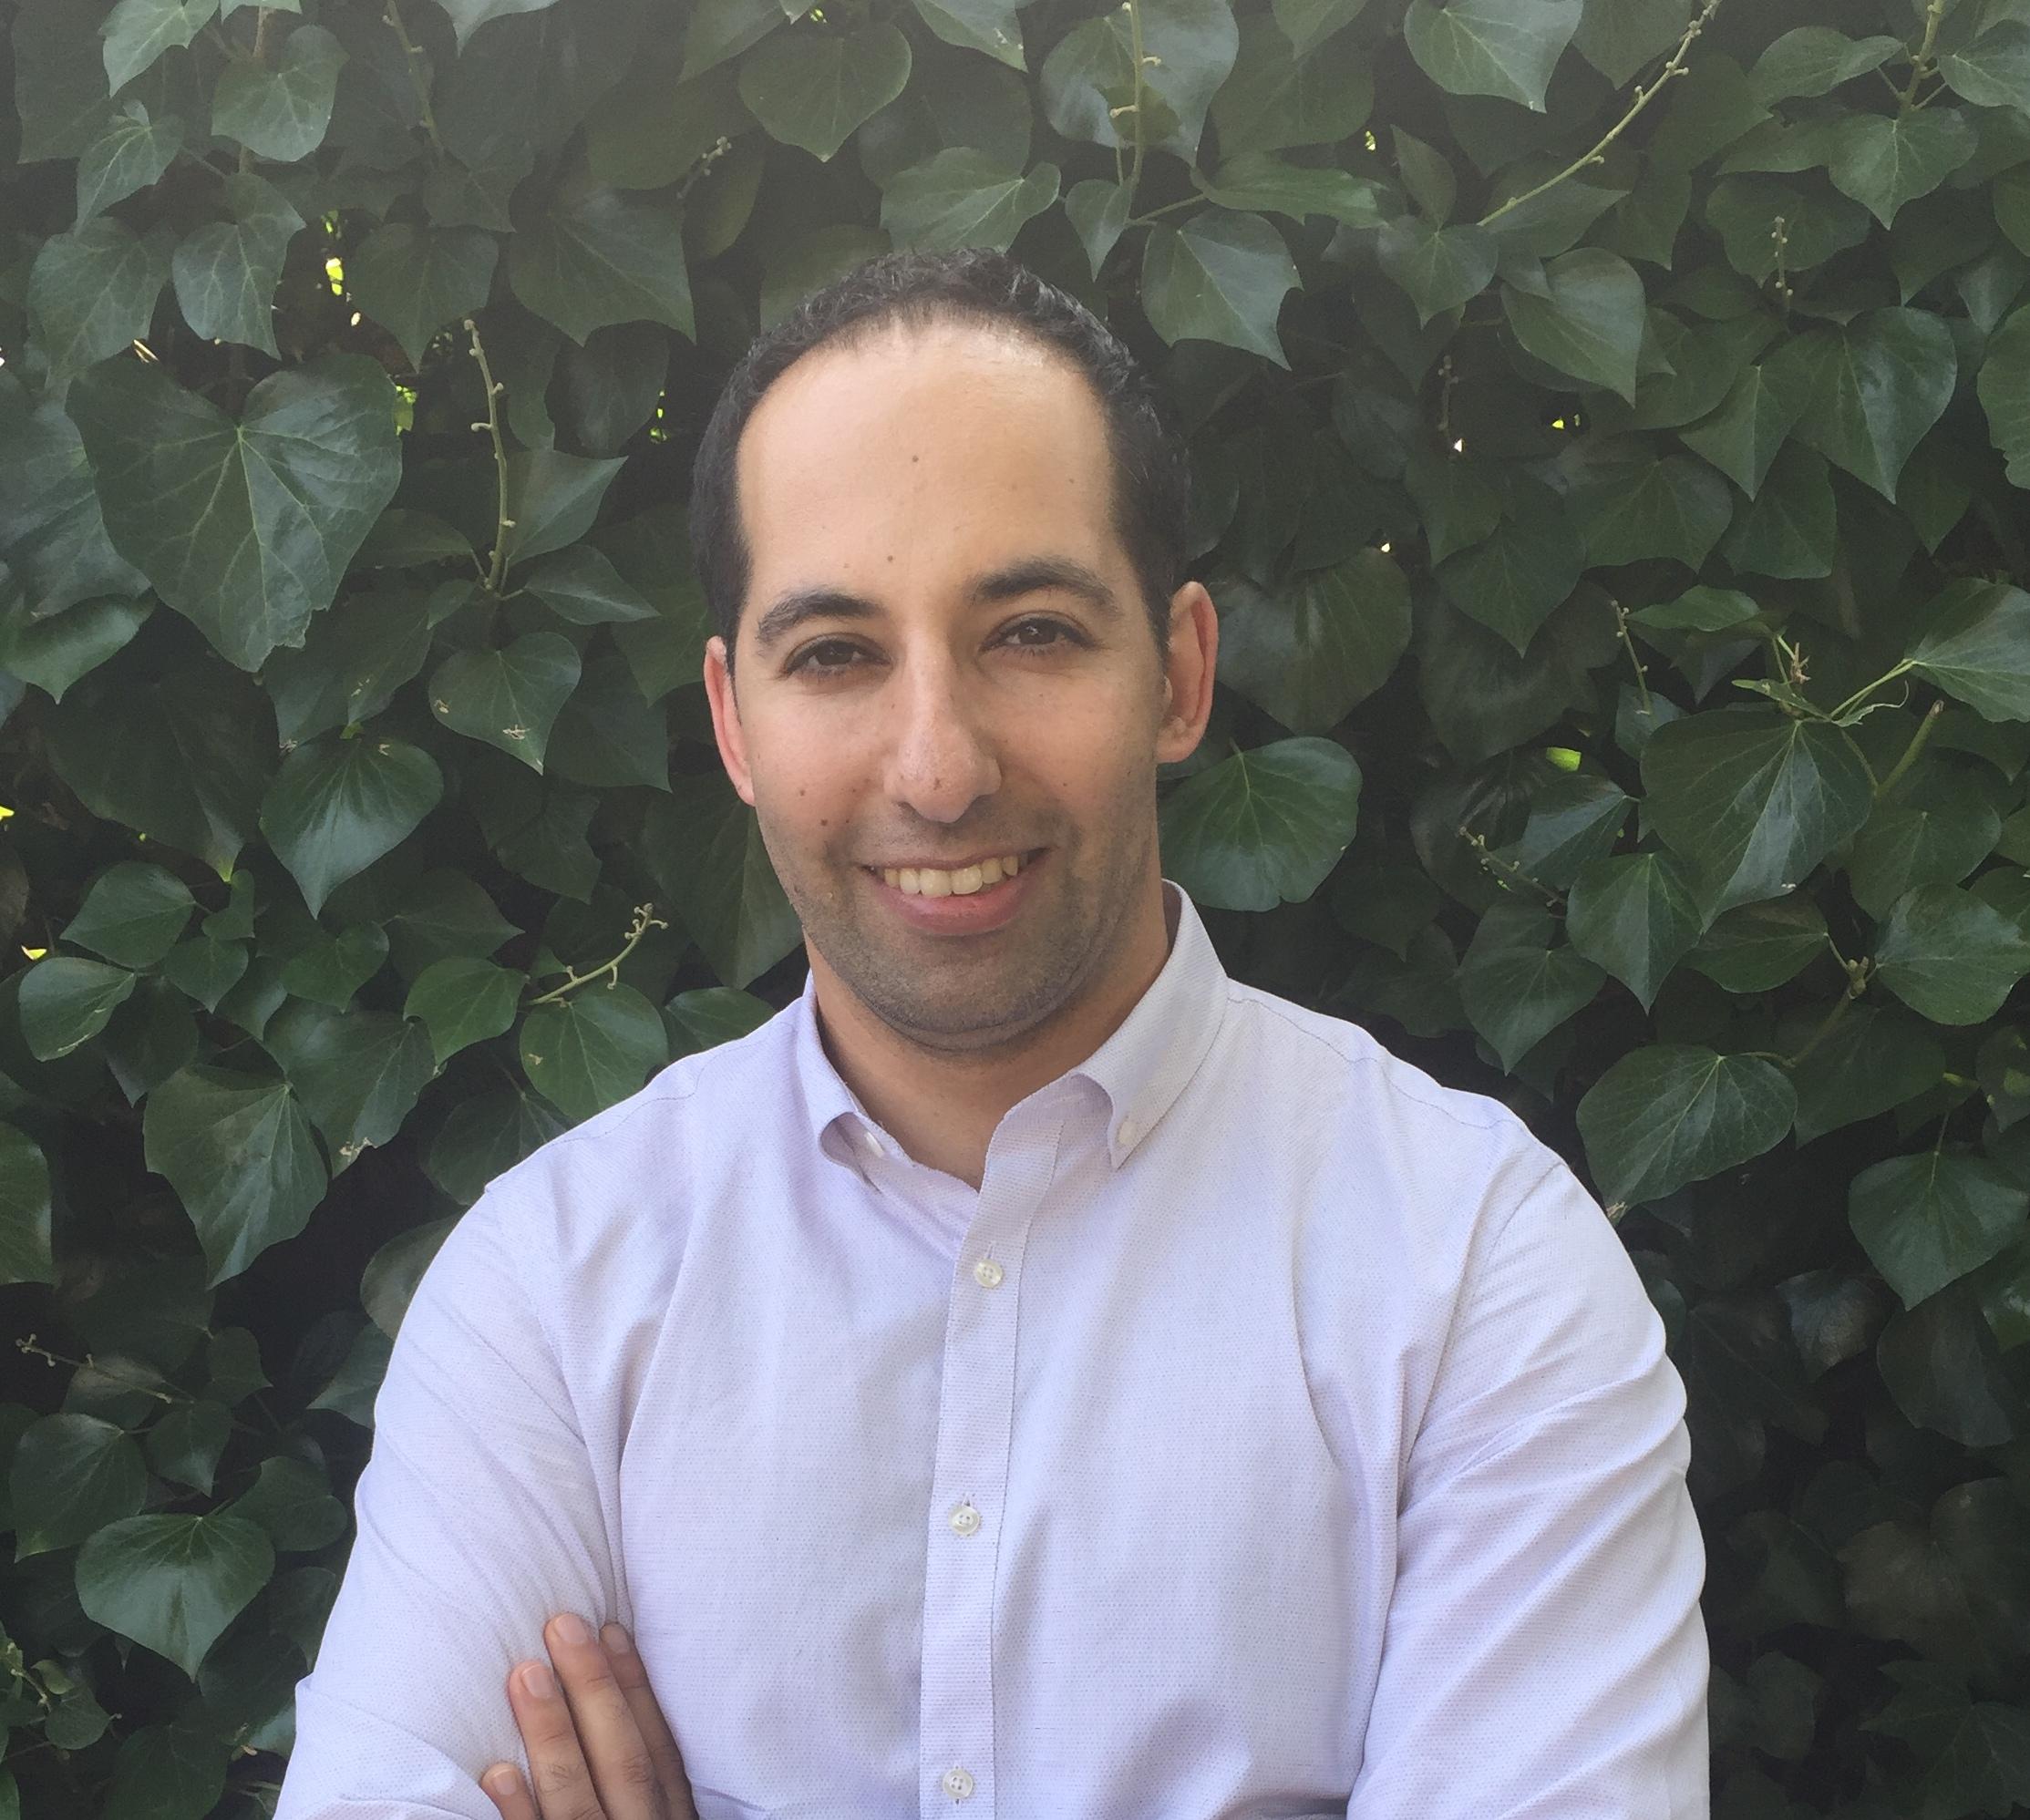 Paediatrician Dr Jonathan (Yoni) Ajzner